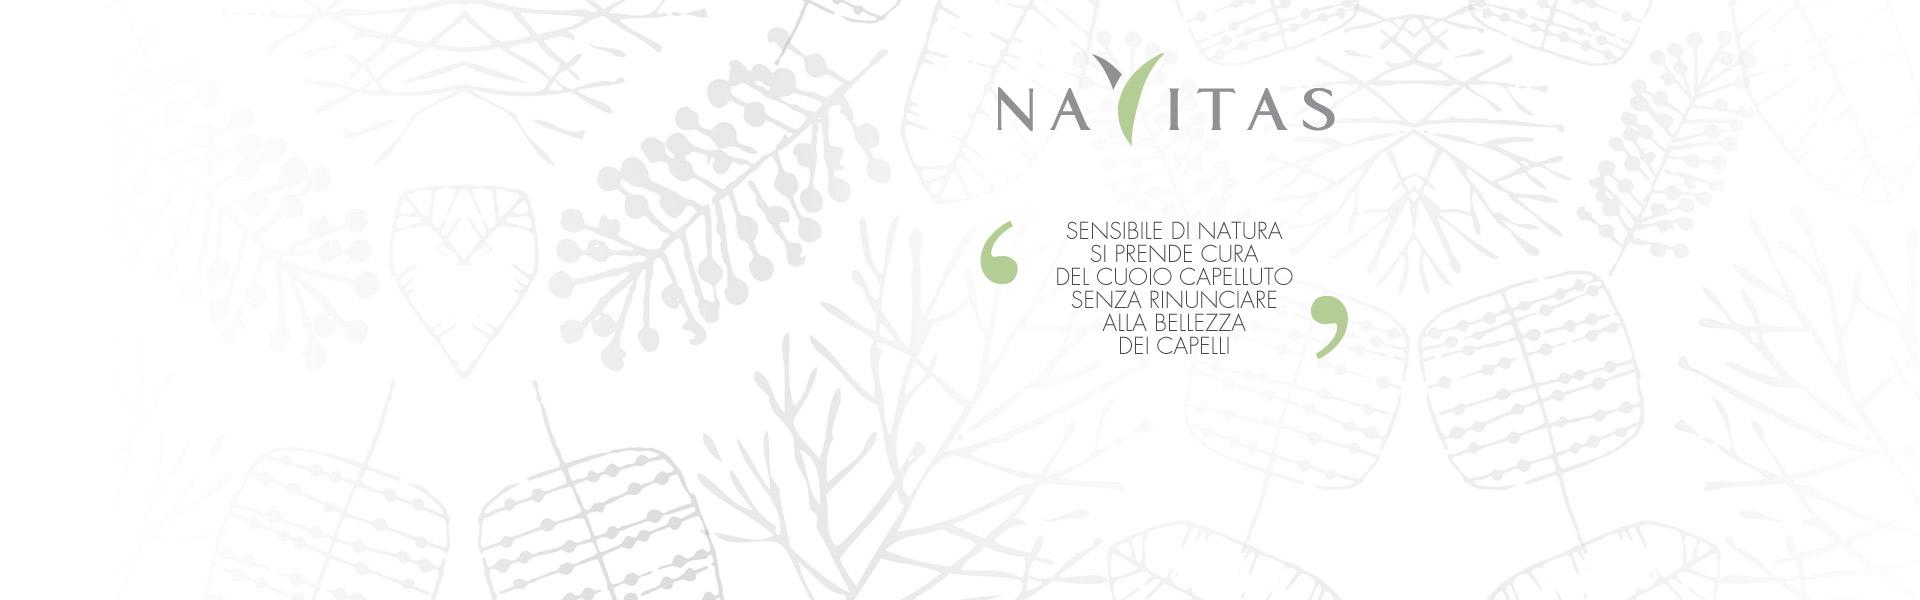 navitas_IT